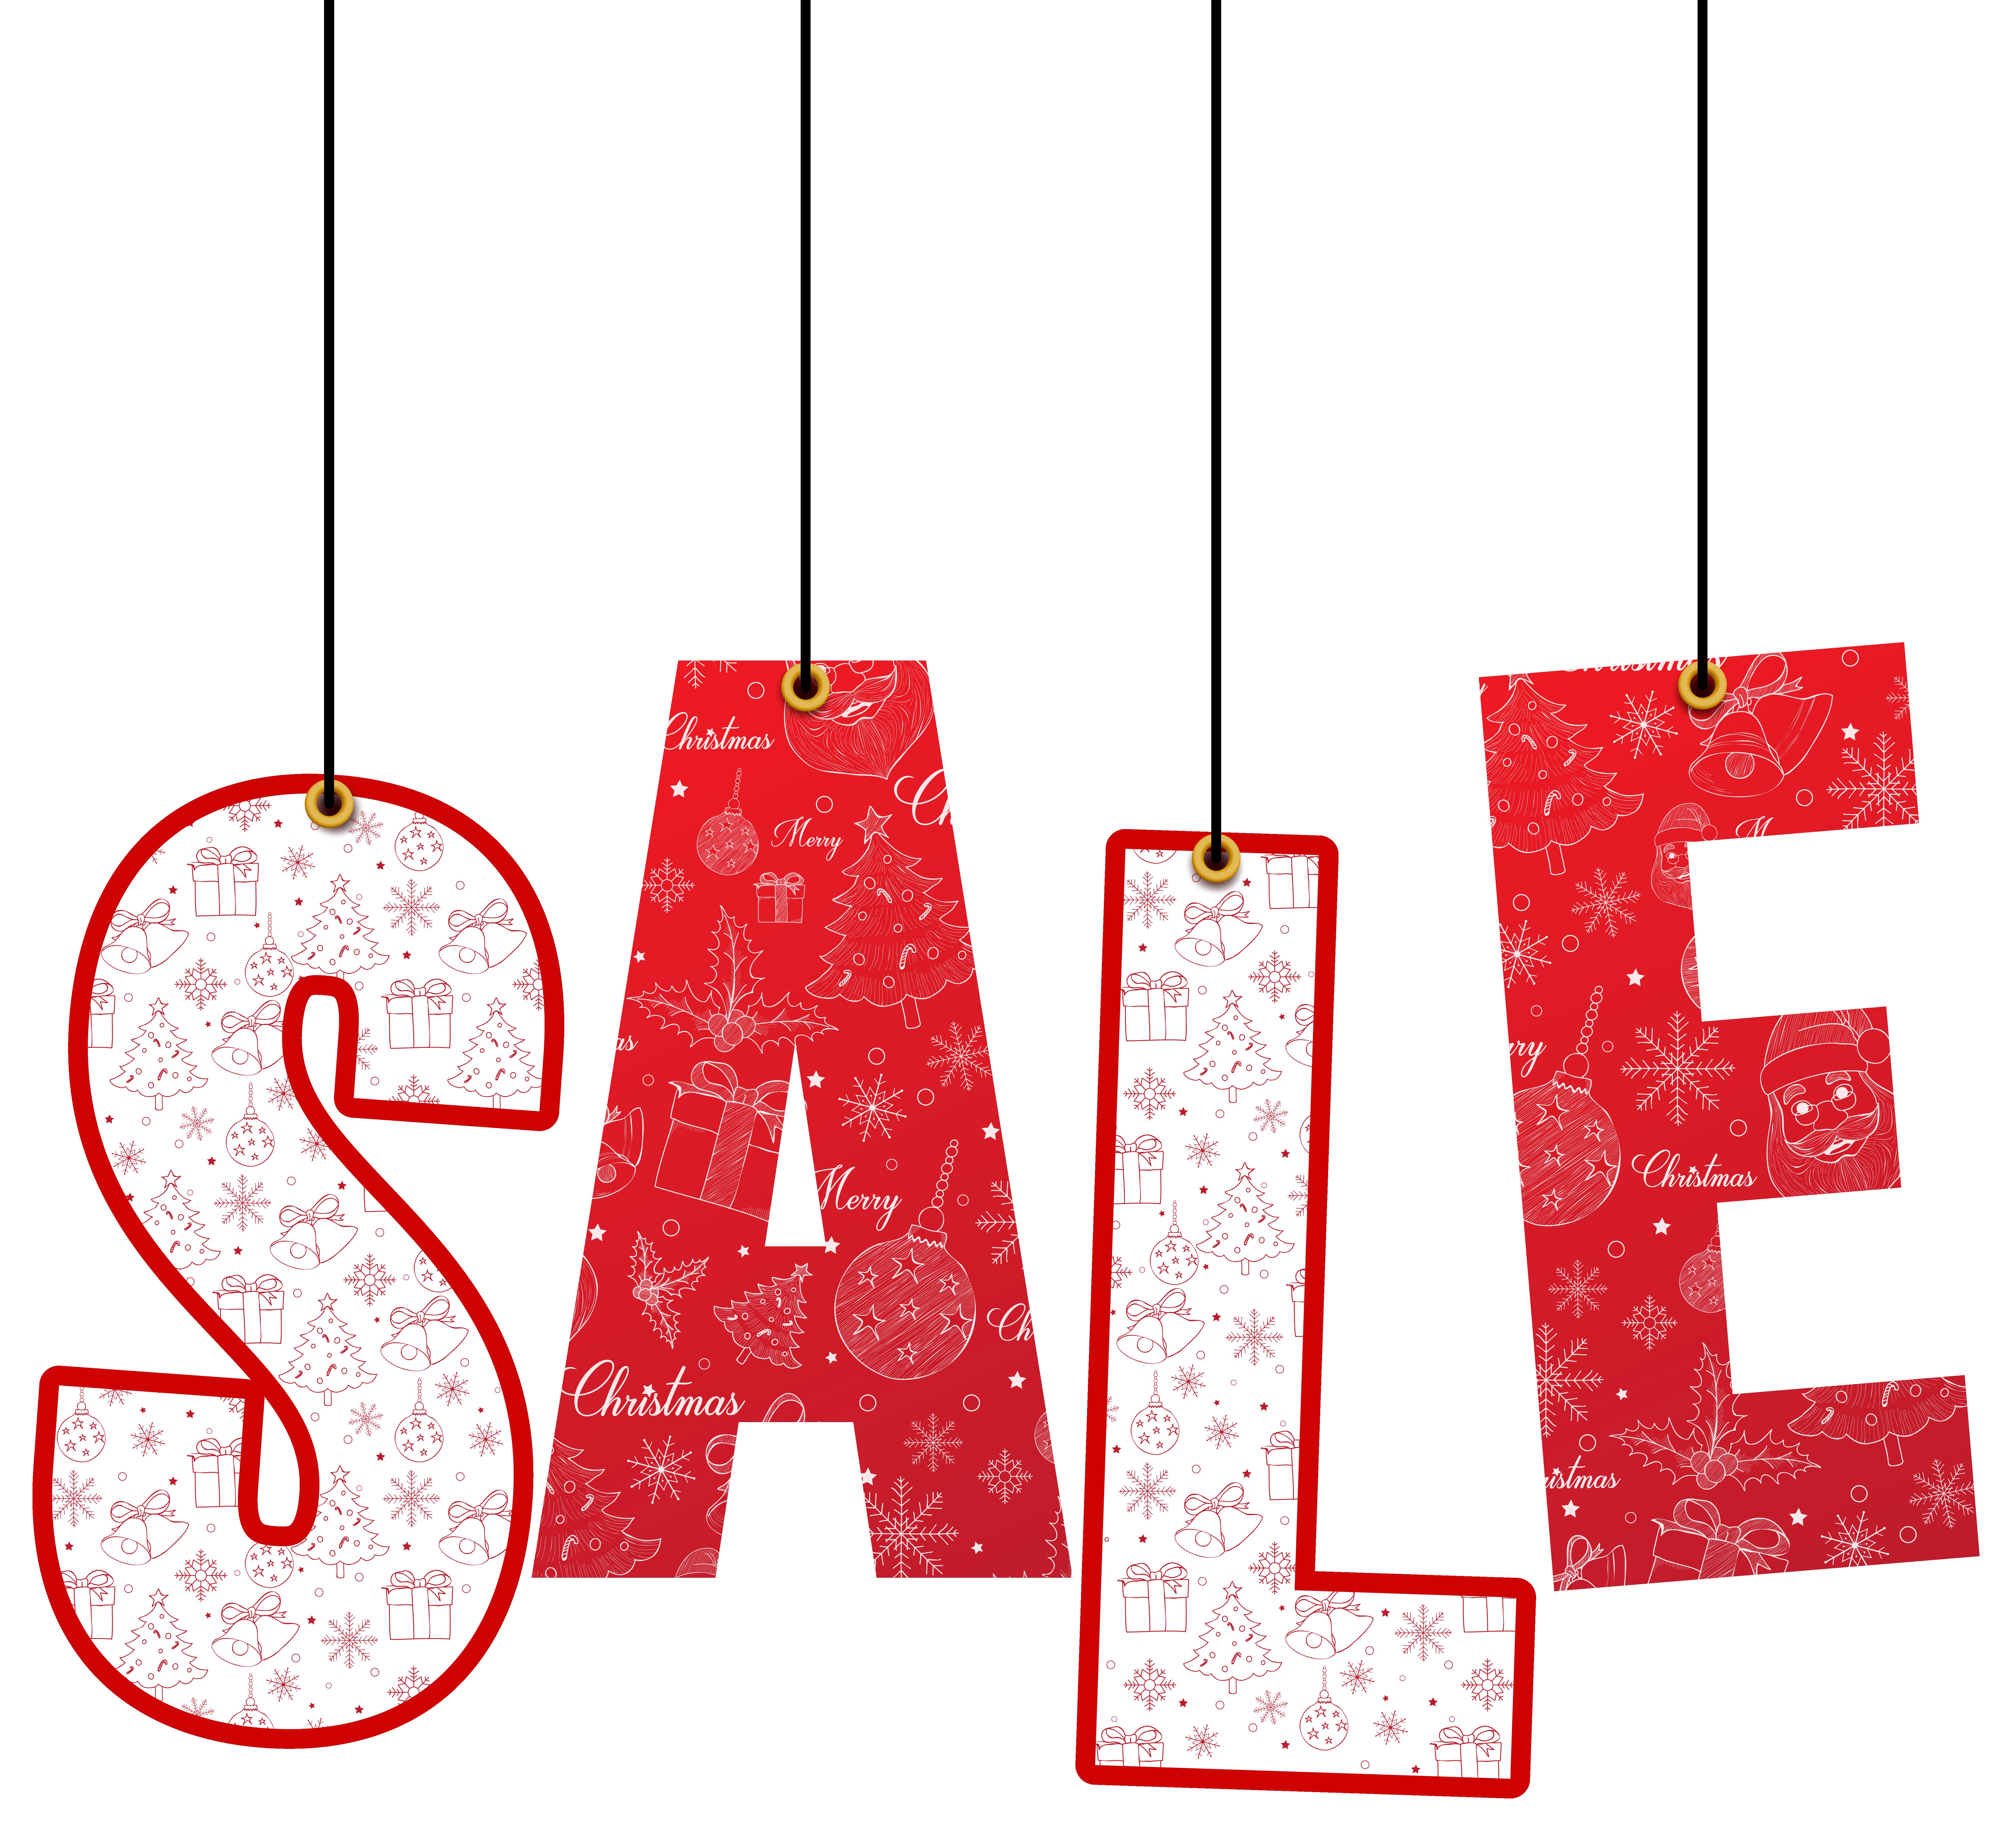 Christmas sale clipart vector transparent stock Christmas Hanging Sale Decoration PNG Clip Art Image | Gallery ... vector transparent stock